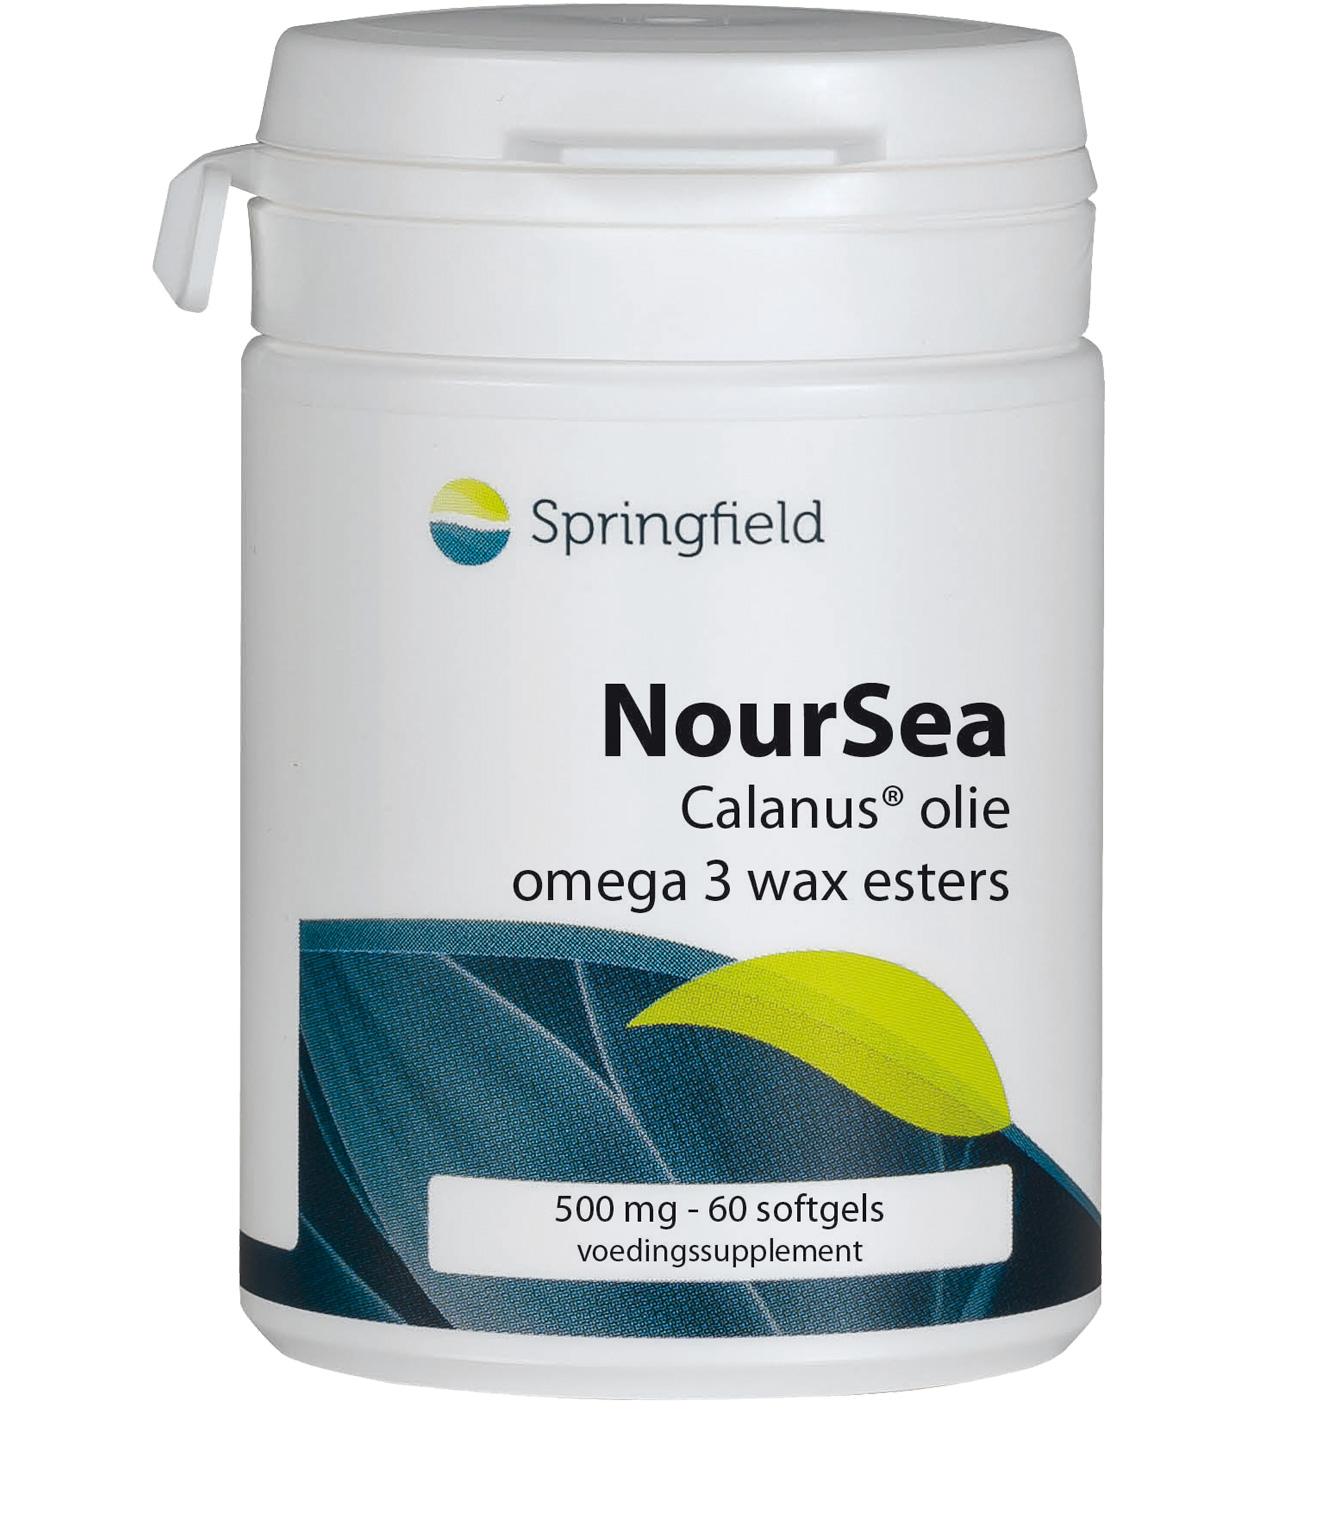 Noursea - Calanus olie - omega 3 wax esters